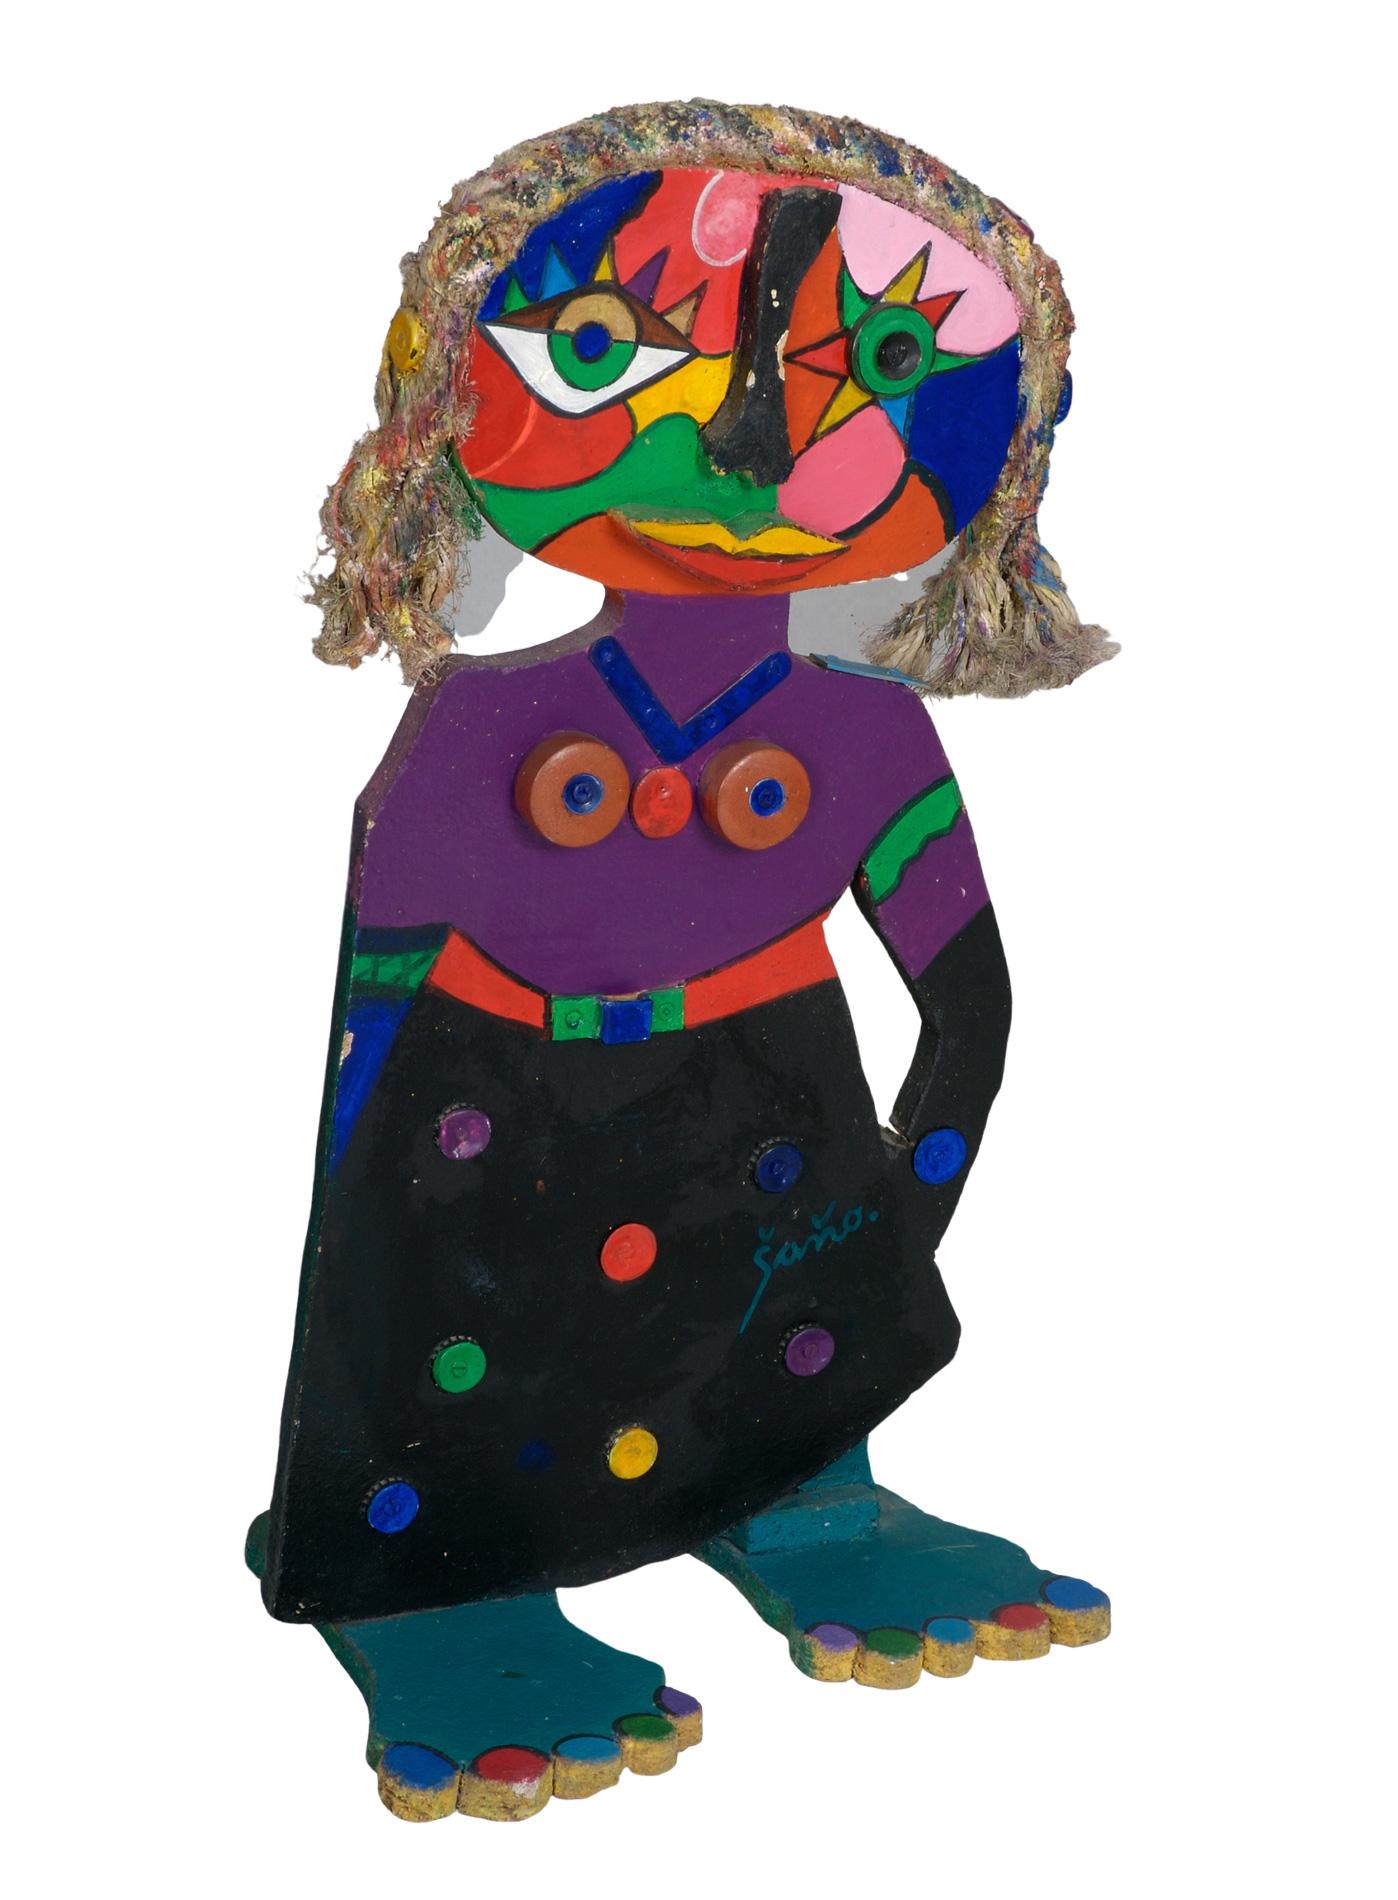 Mafalda_sculpture-sano-ludovit-daniel